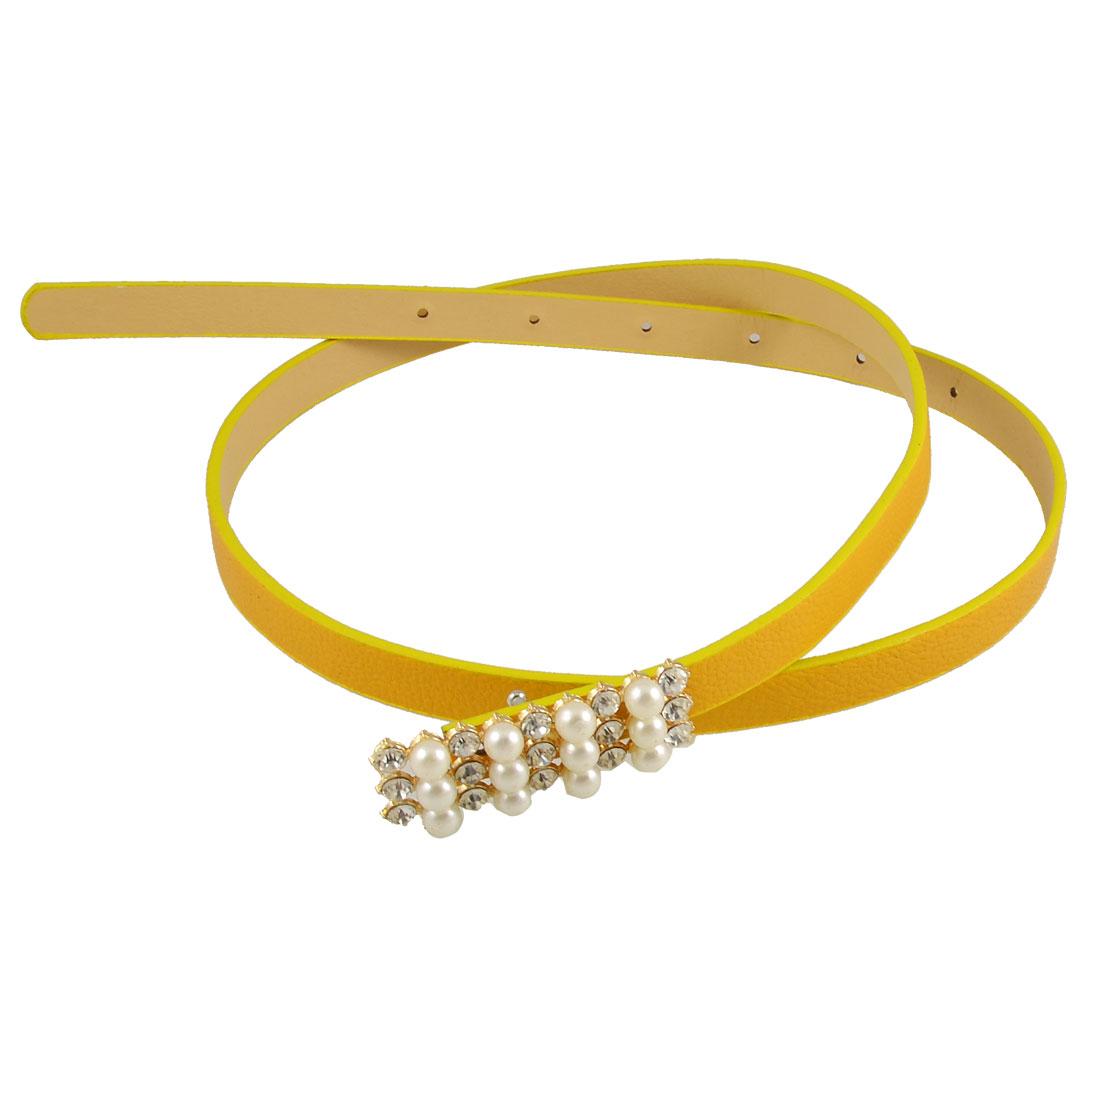 Woman Bead Accent Fashion Dark Yellow Perforated Slim Band Belt